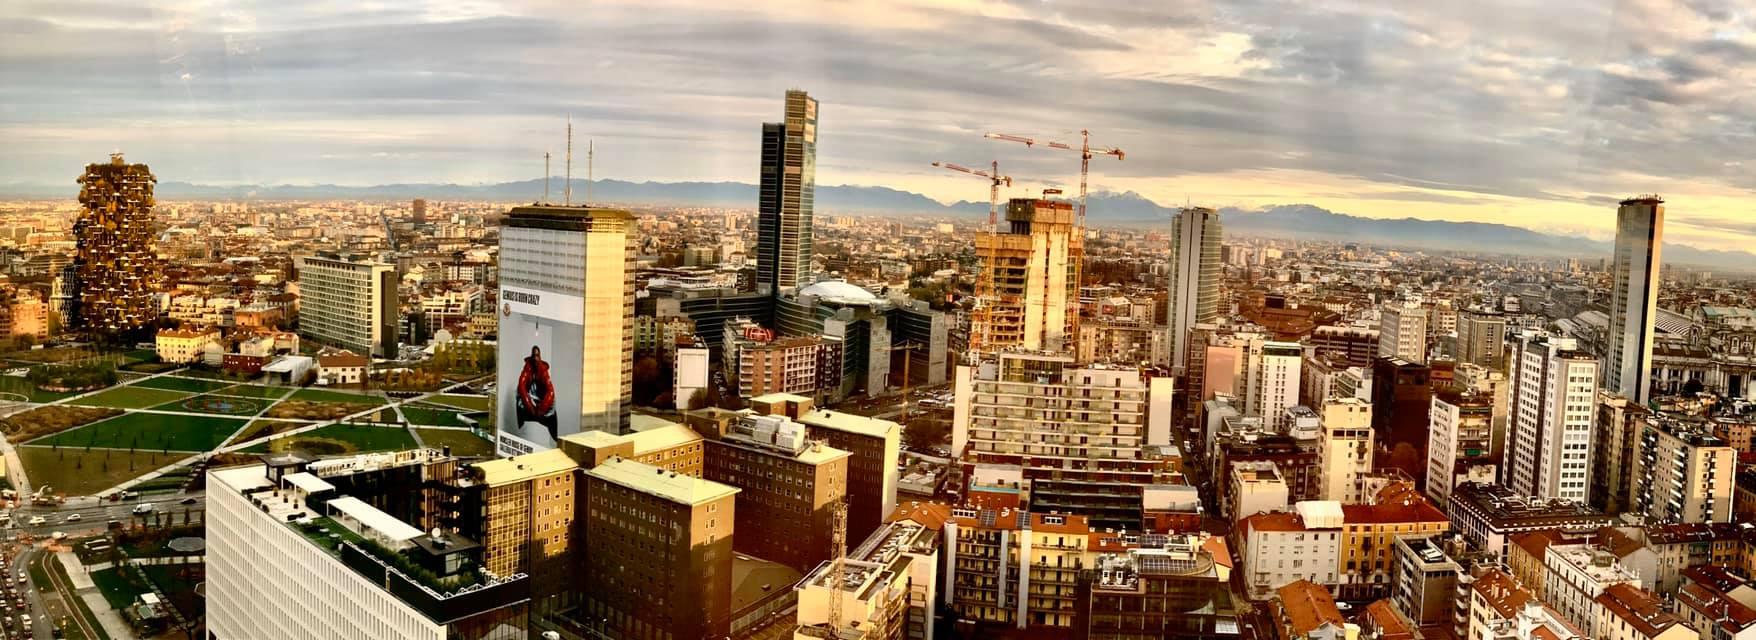 Skyline di Milano, visto da Torre Diamante - ©2019 David Hanoman